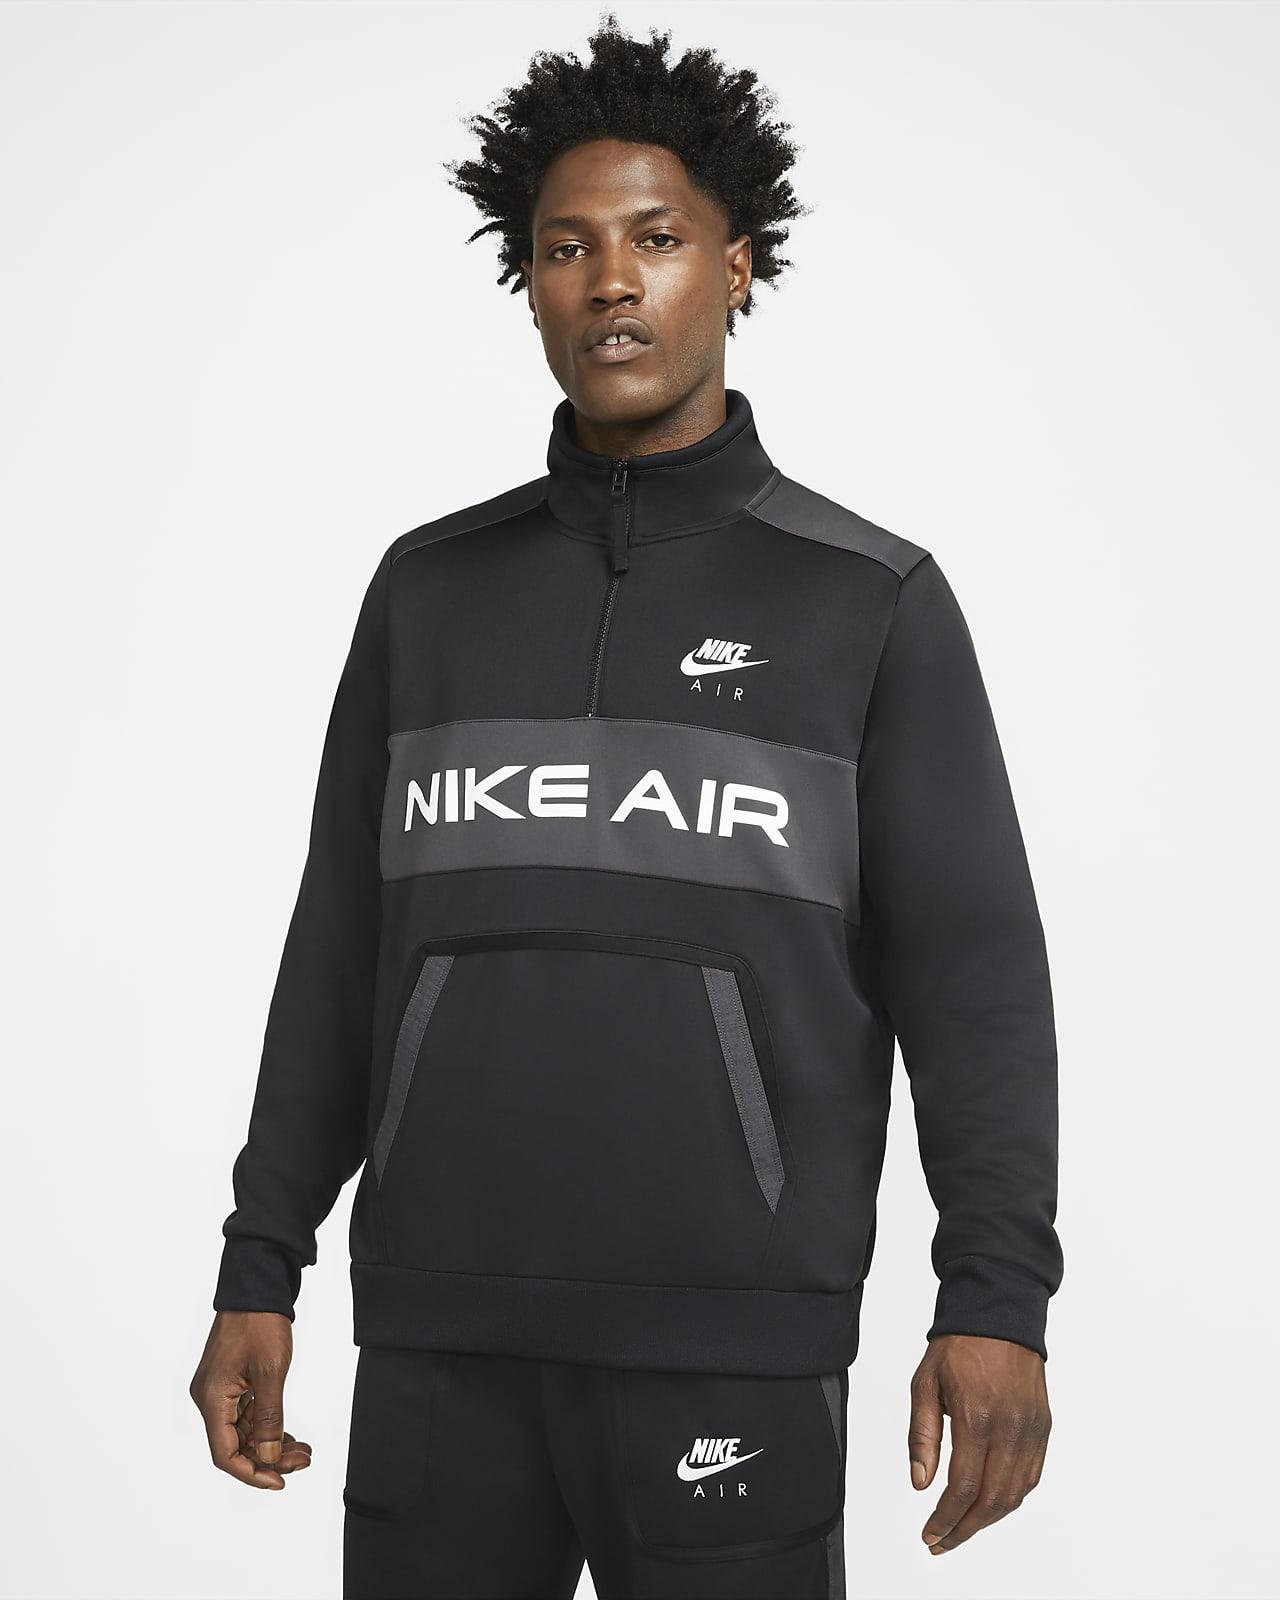 Nike Air Men's Jacket